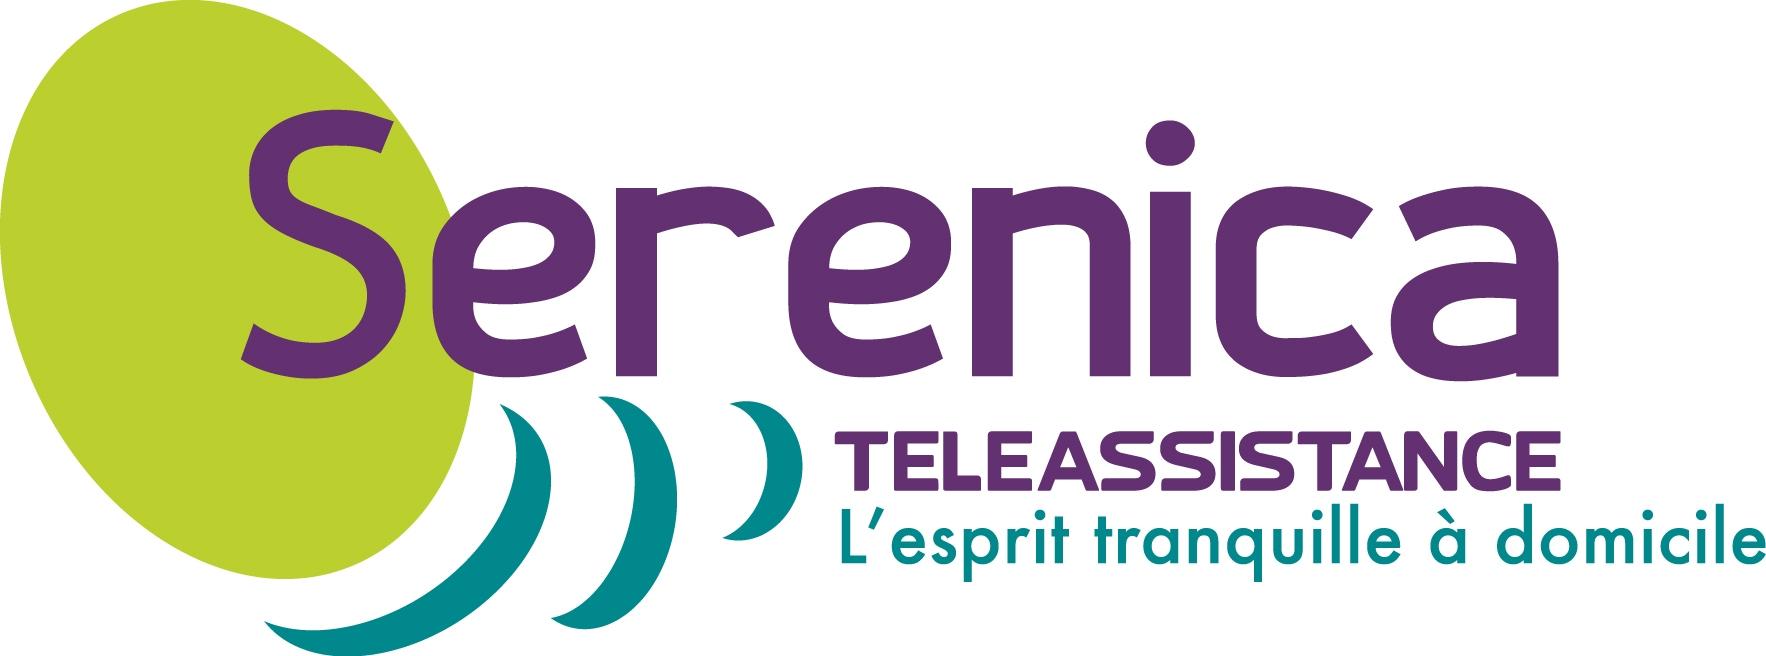 Serenica Téléassistance